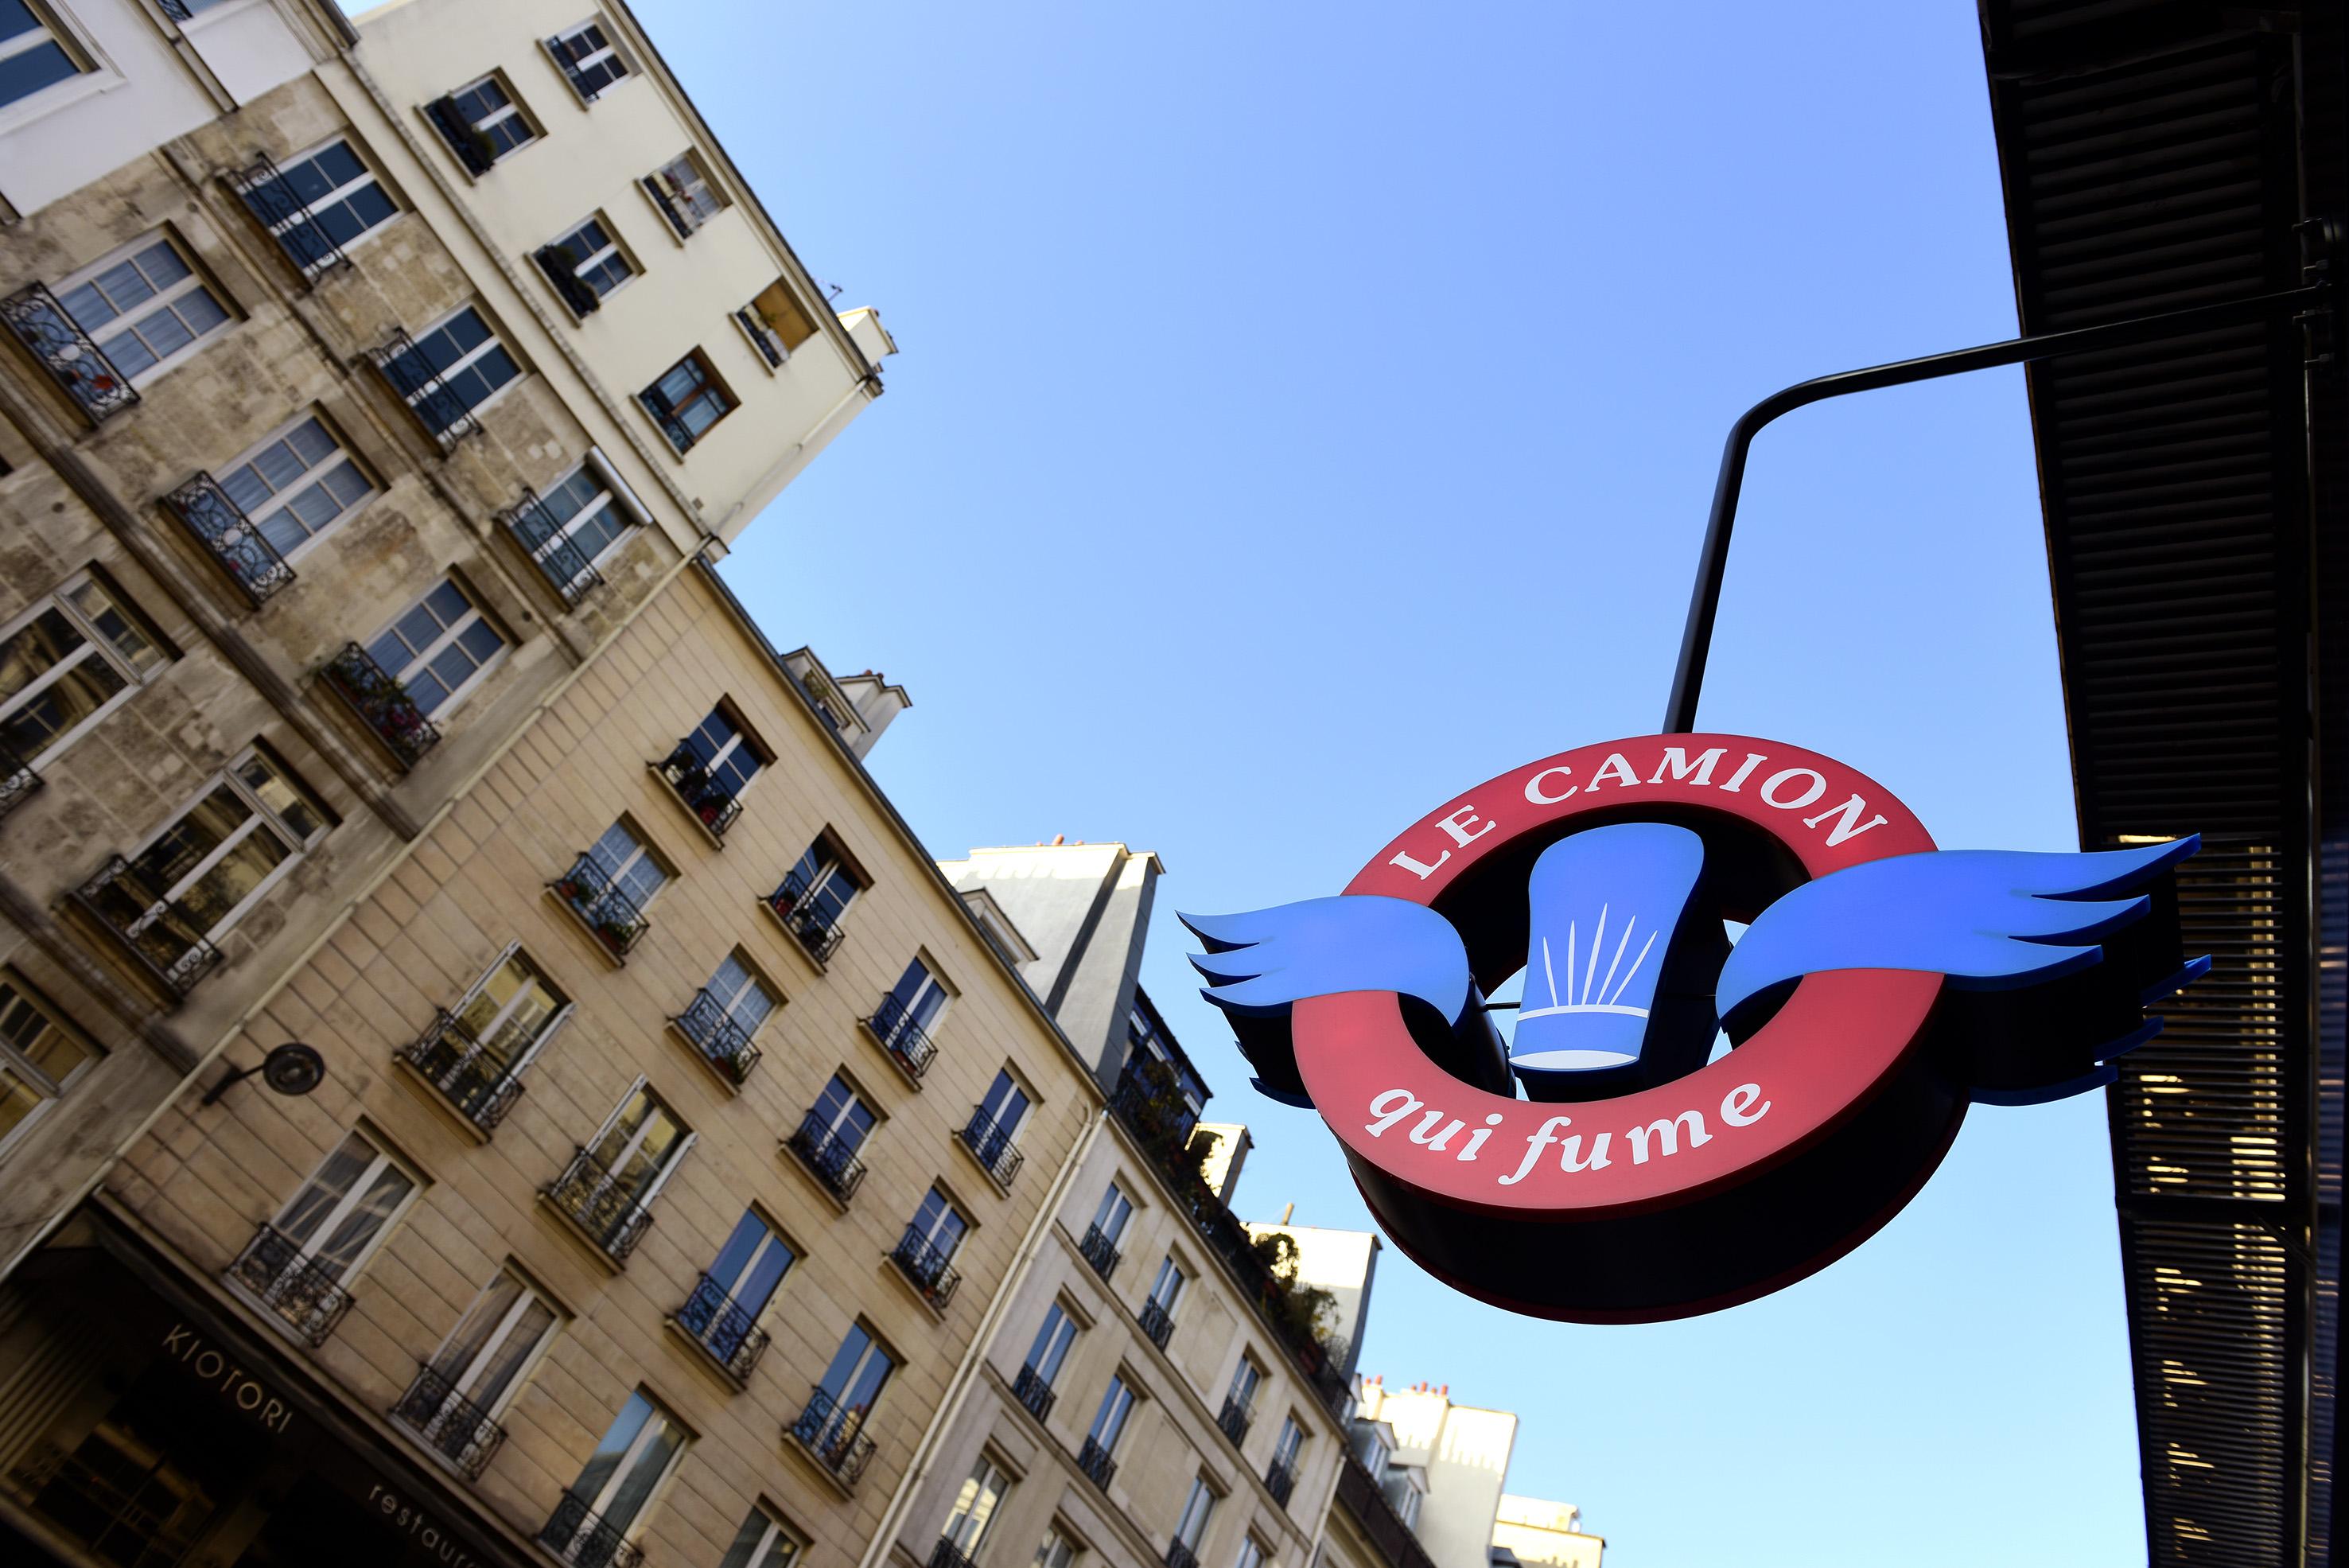 Restaurant Le Camion qui fume-logo